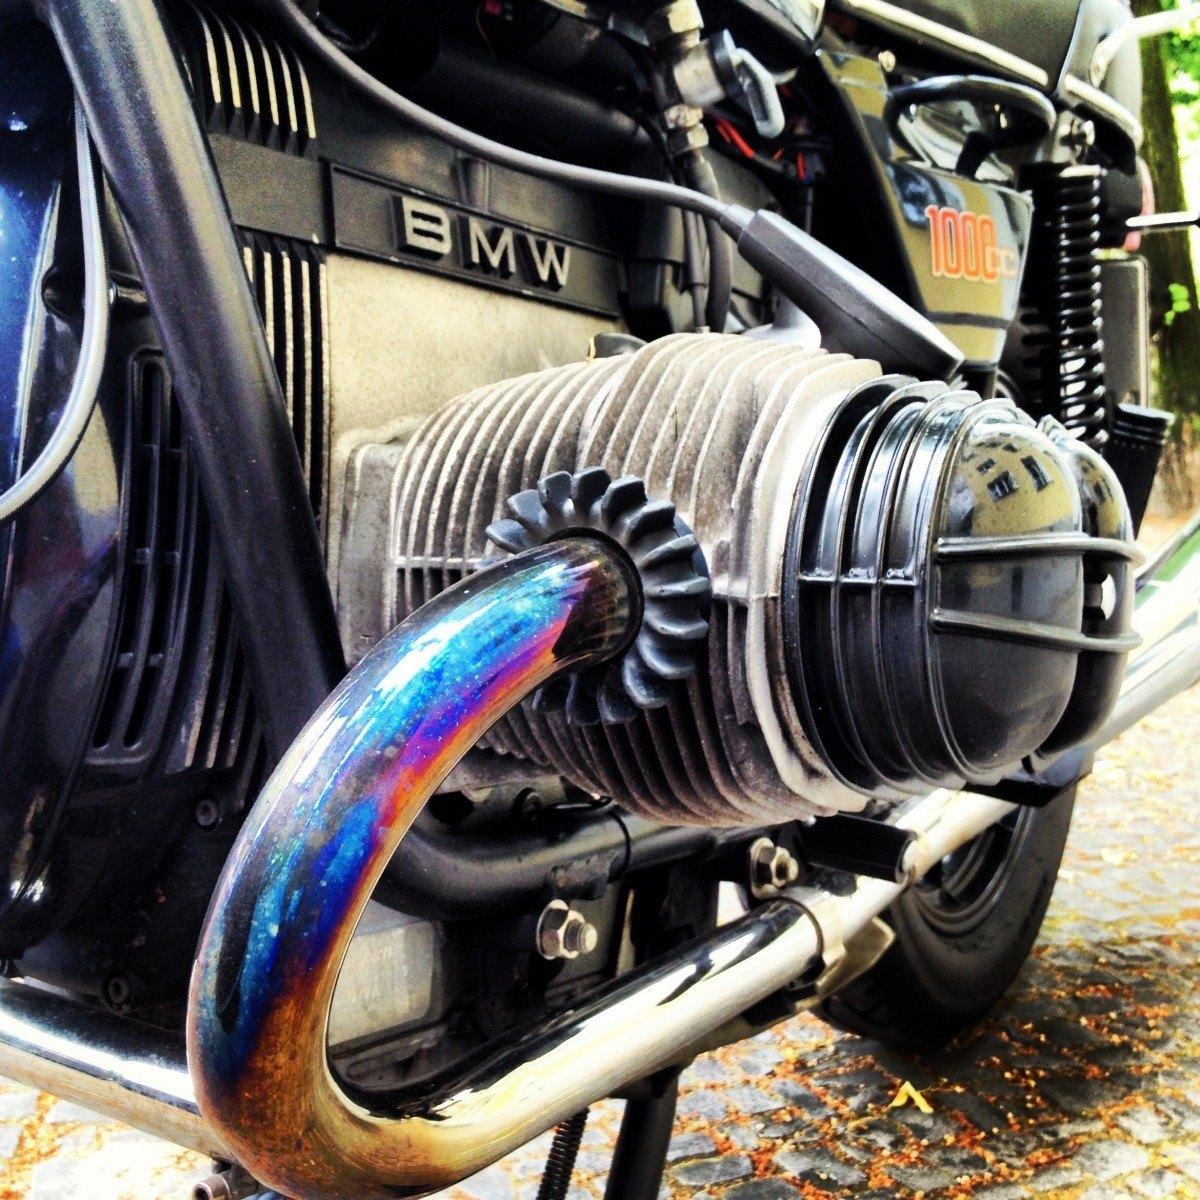 Acheter une moto d'occasion